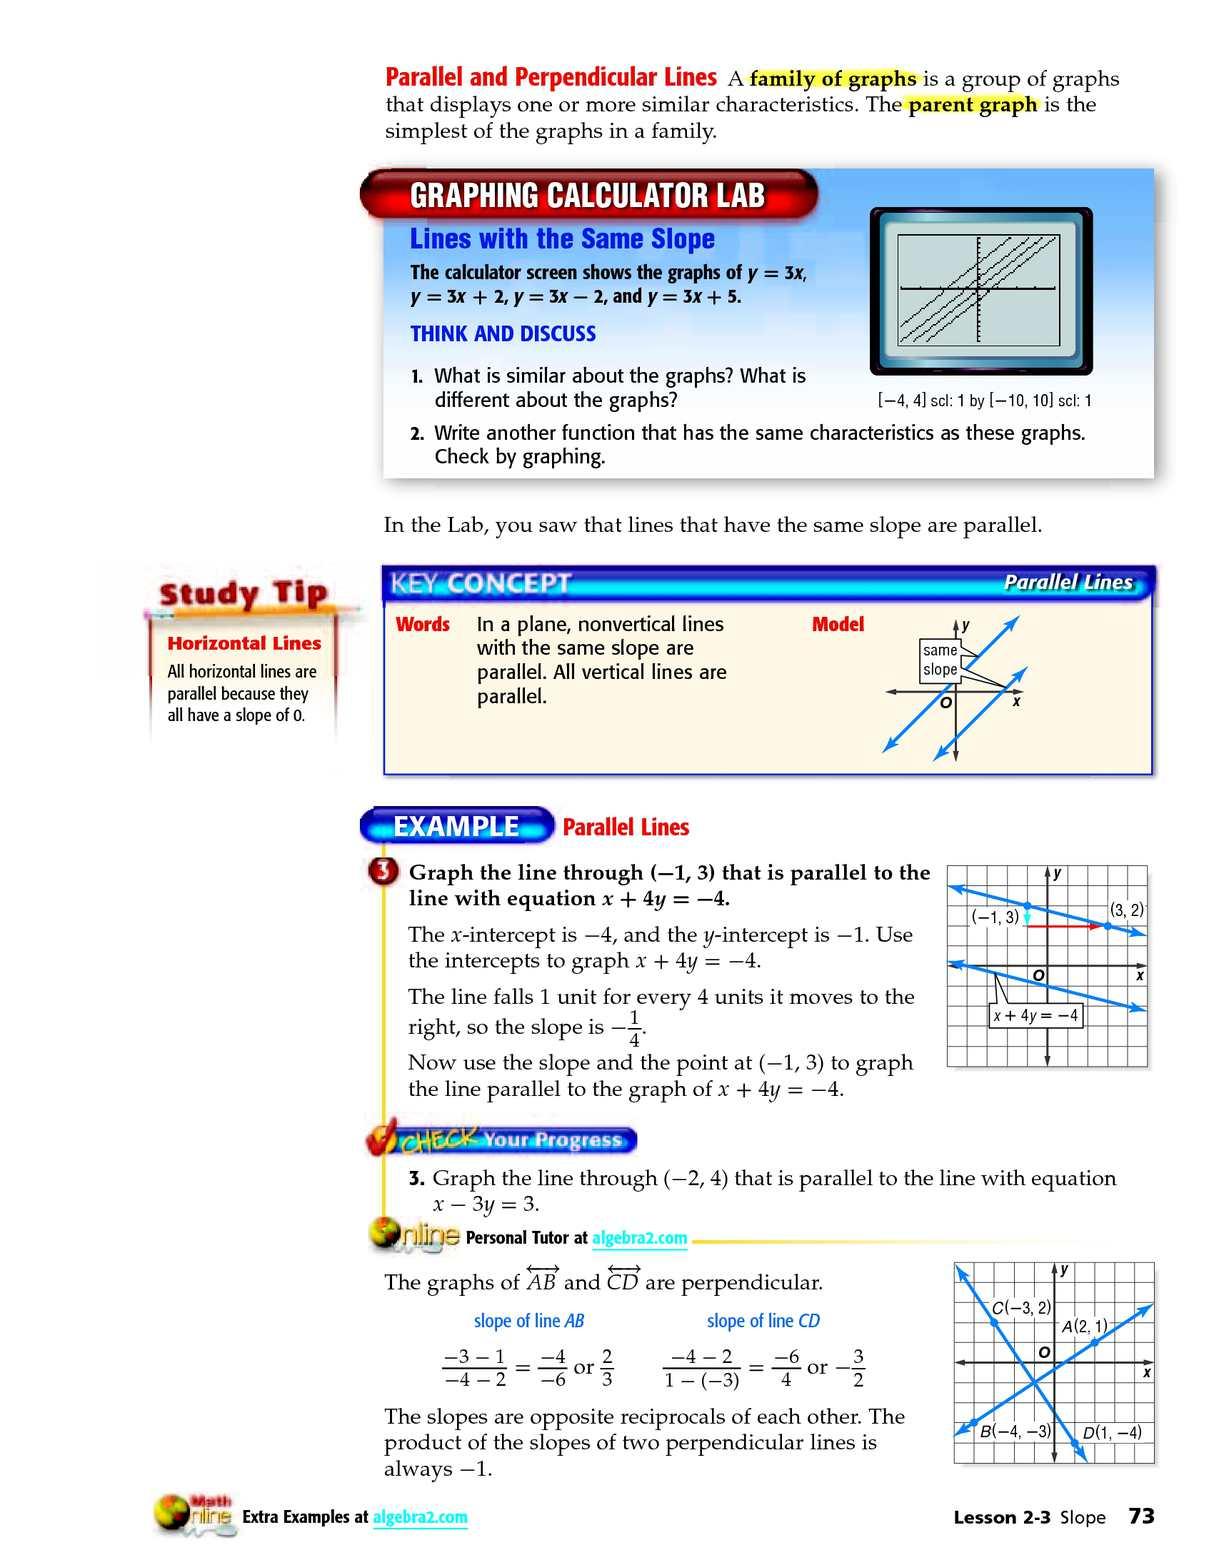 Algebra 2 McGraw-Hill - CALAMEO Downloader